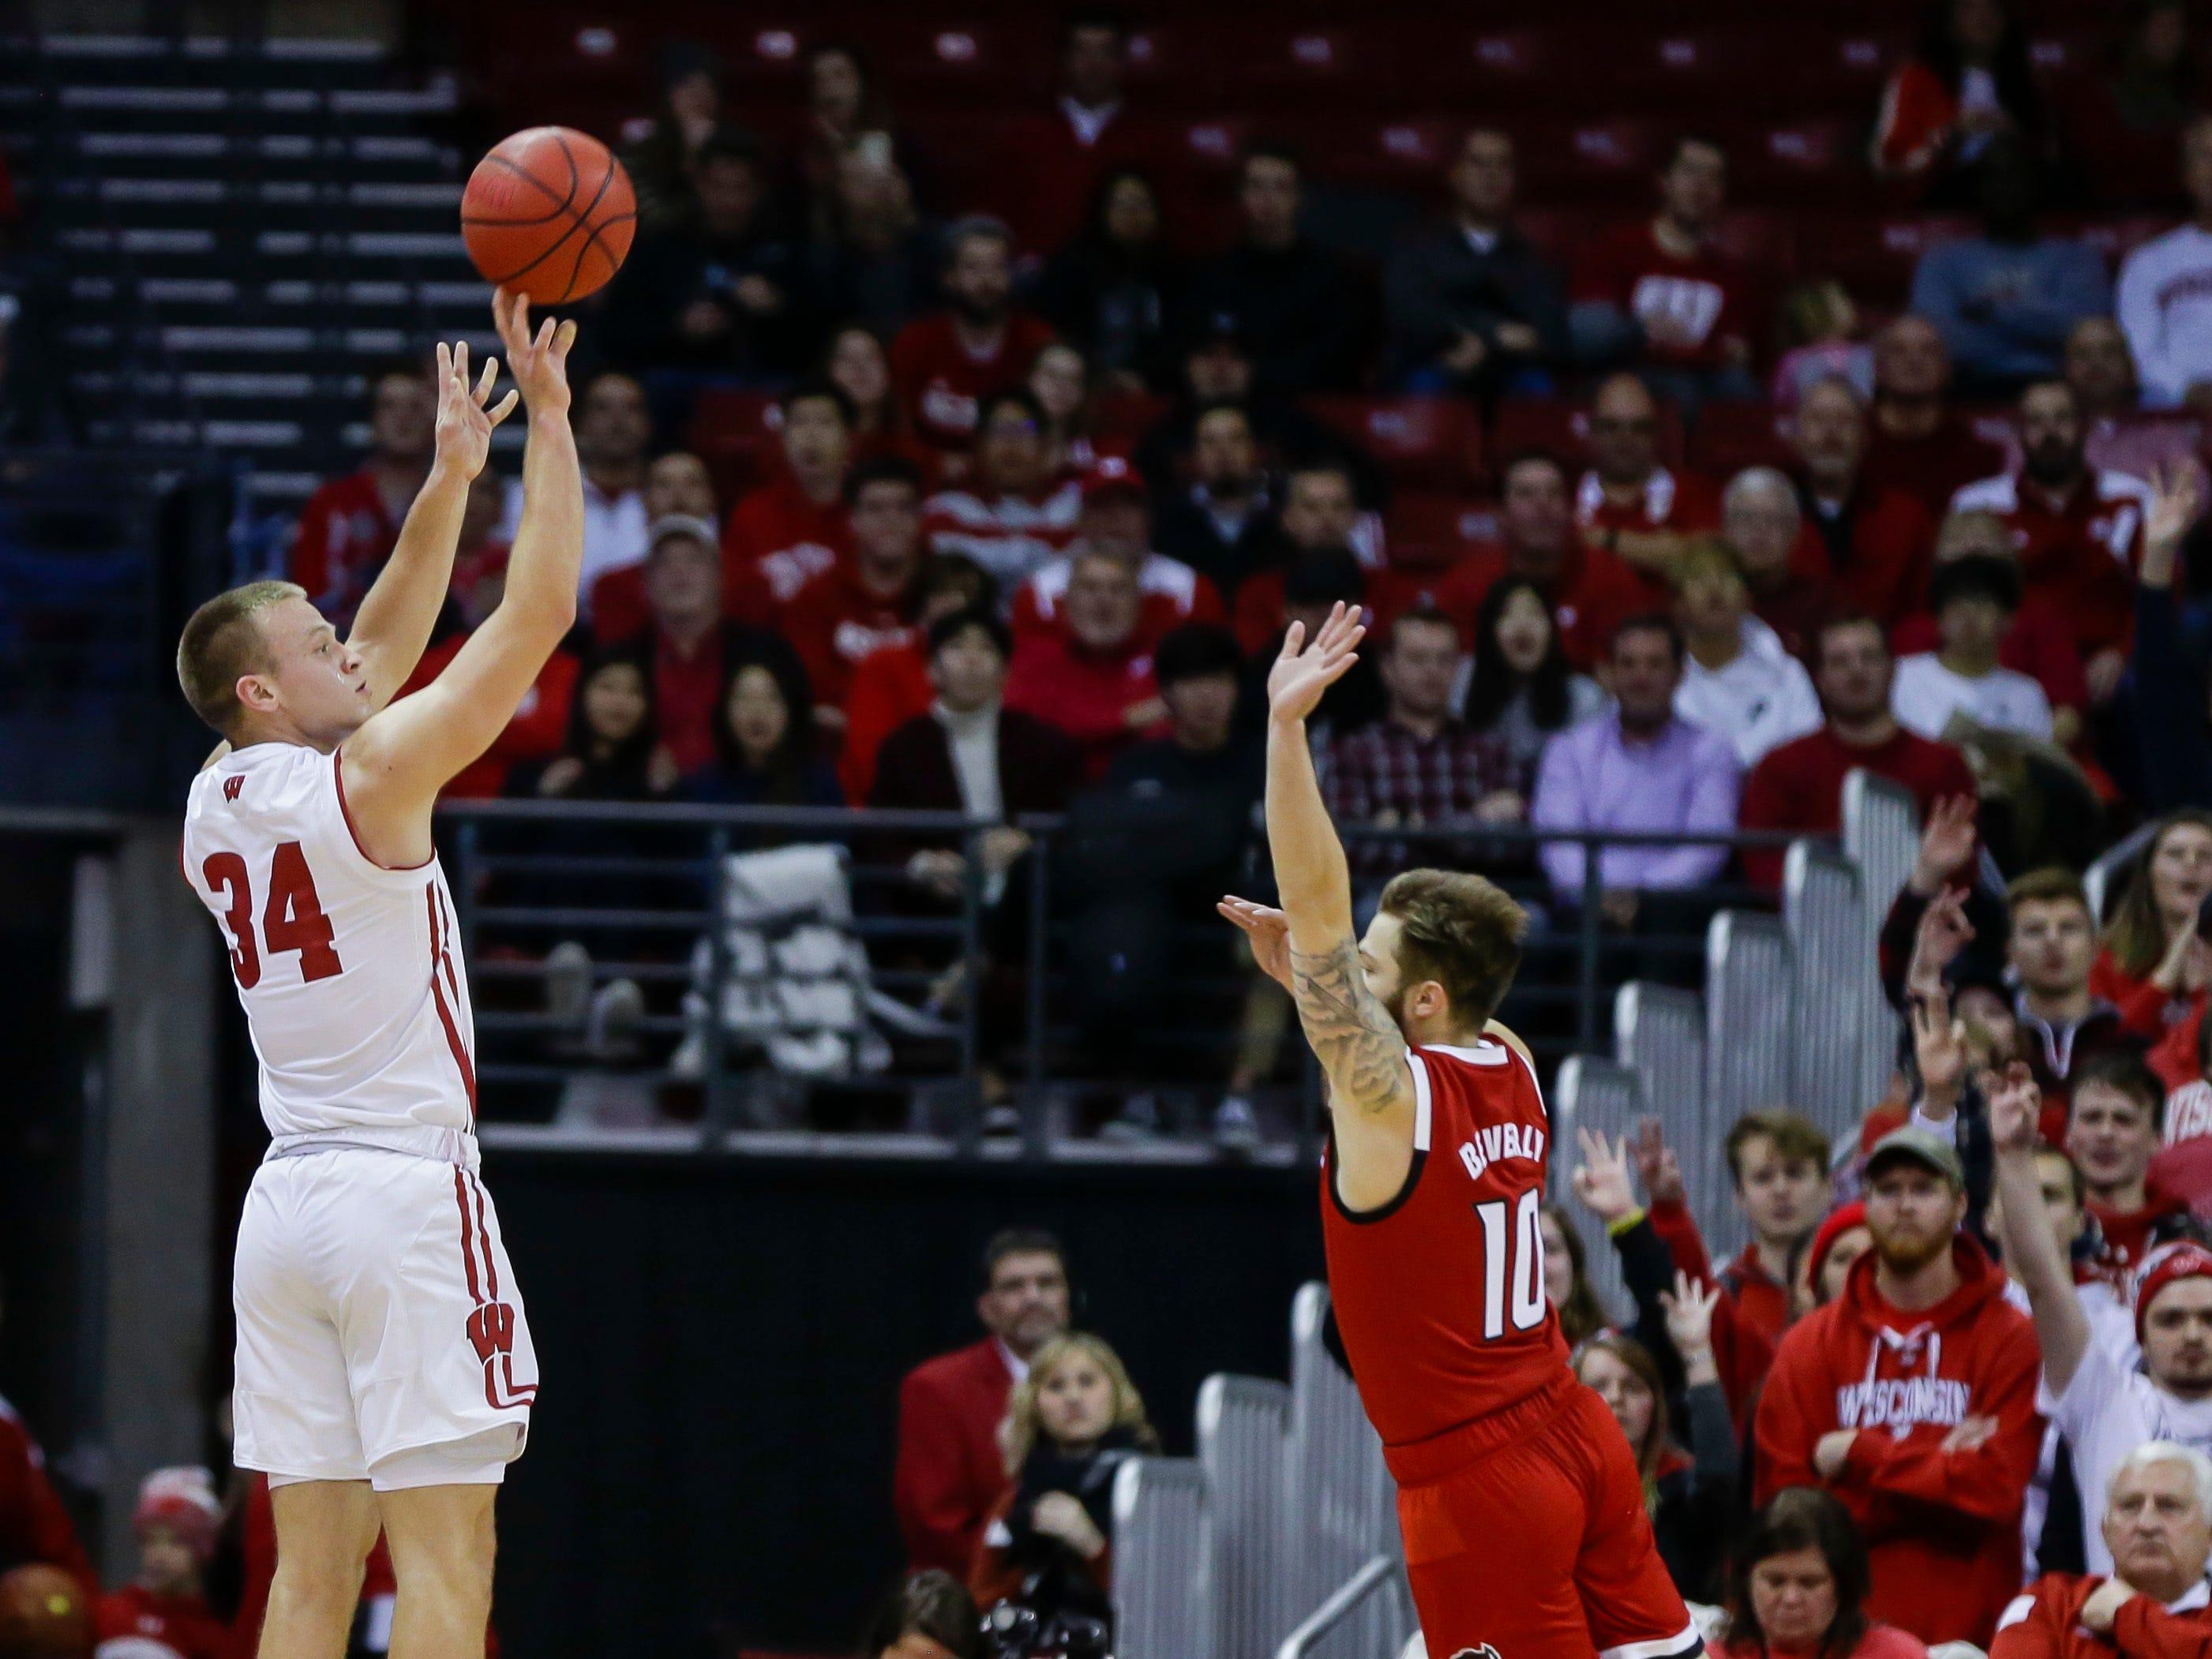 Wisconsin's Brad Davison shoots a three-pointer.